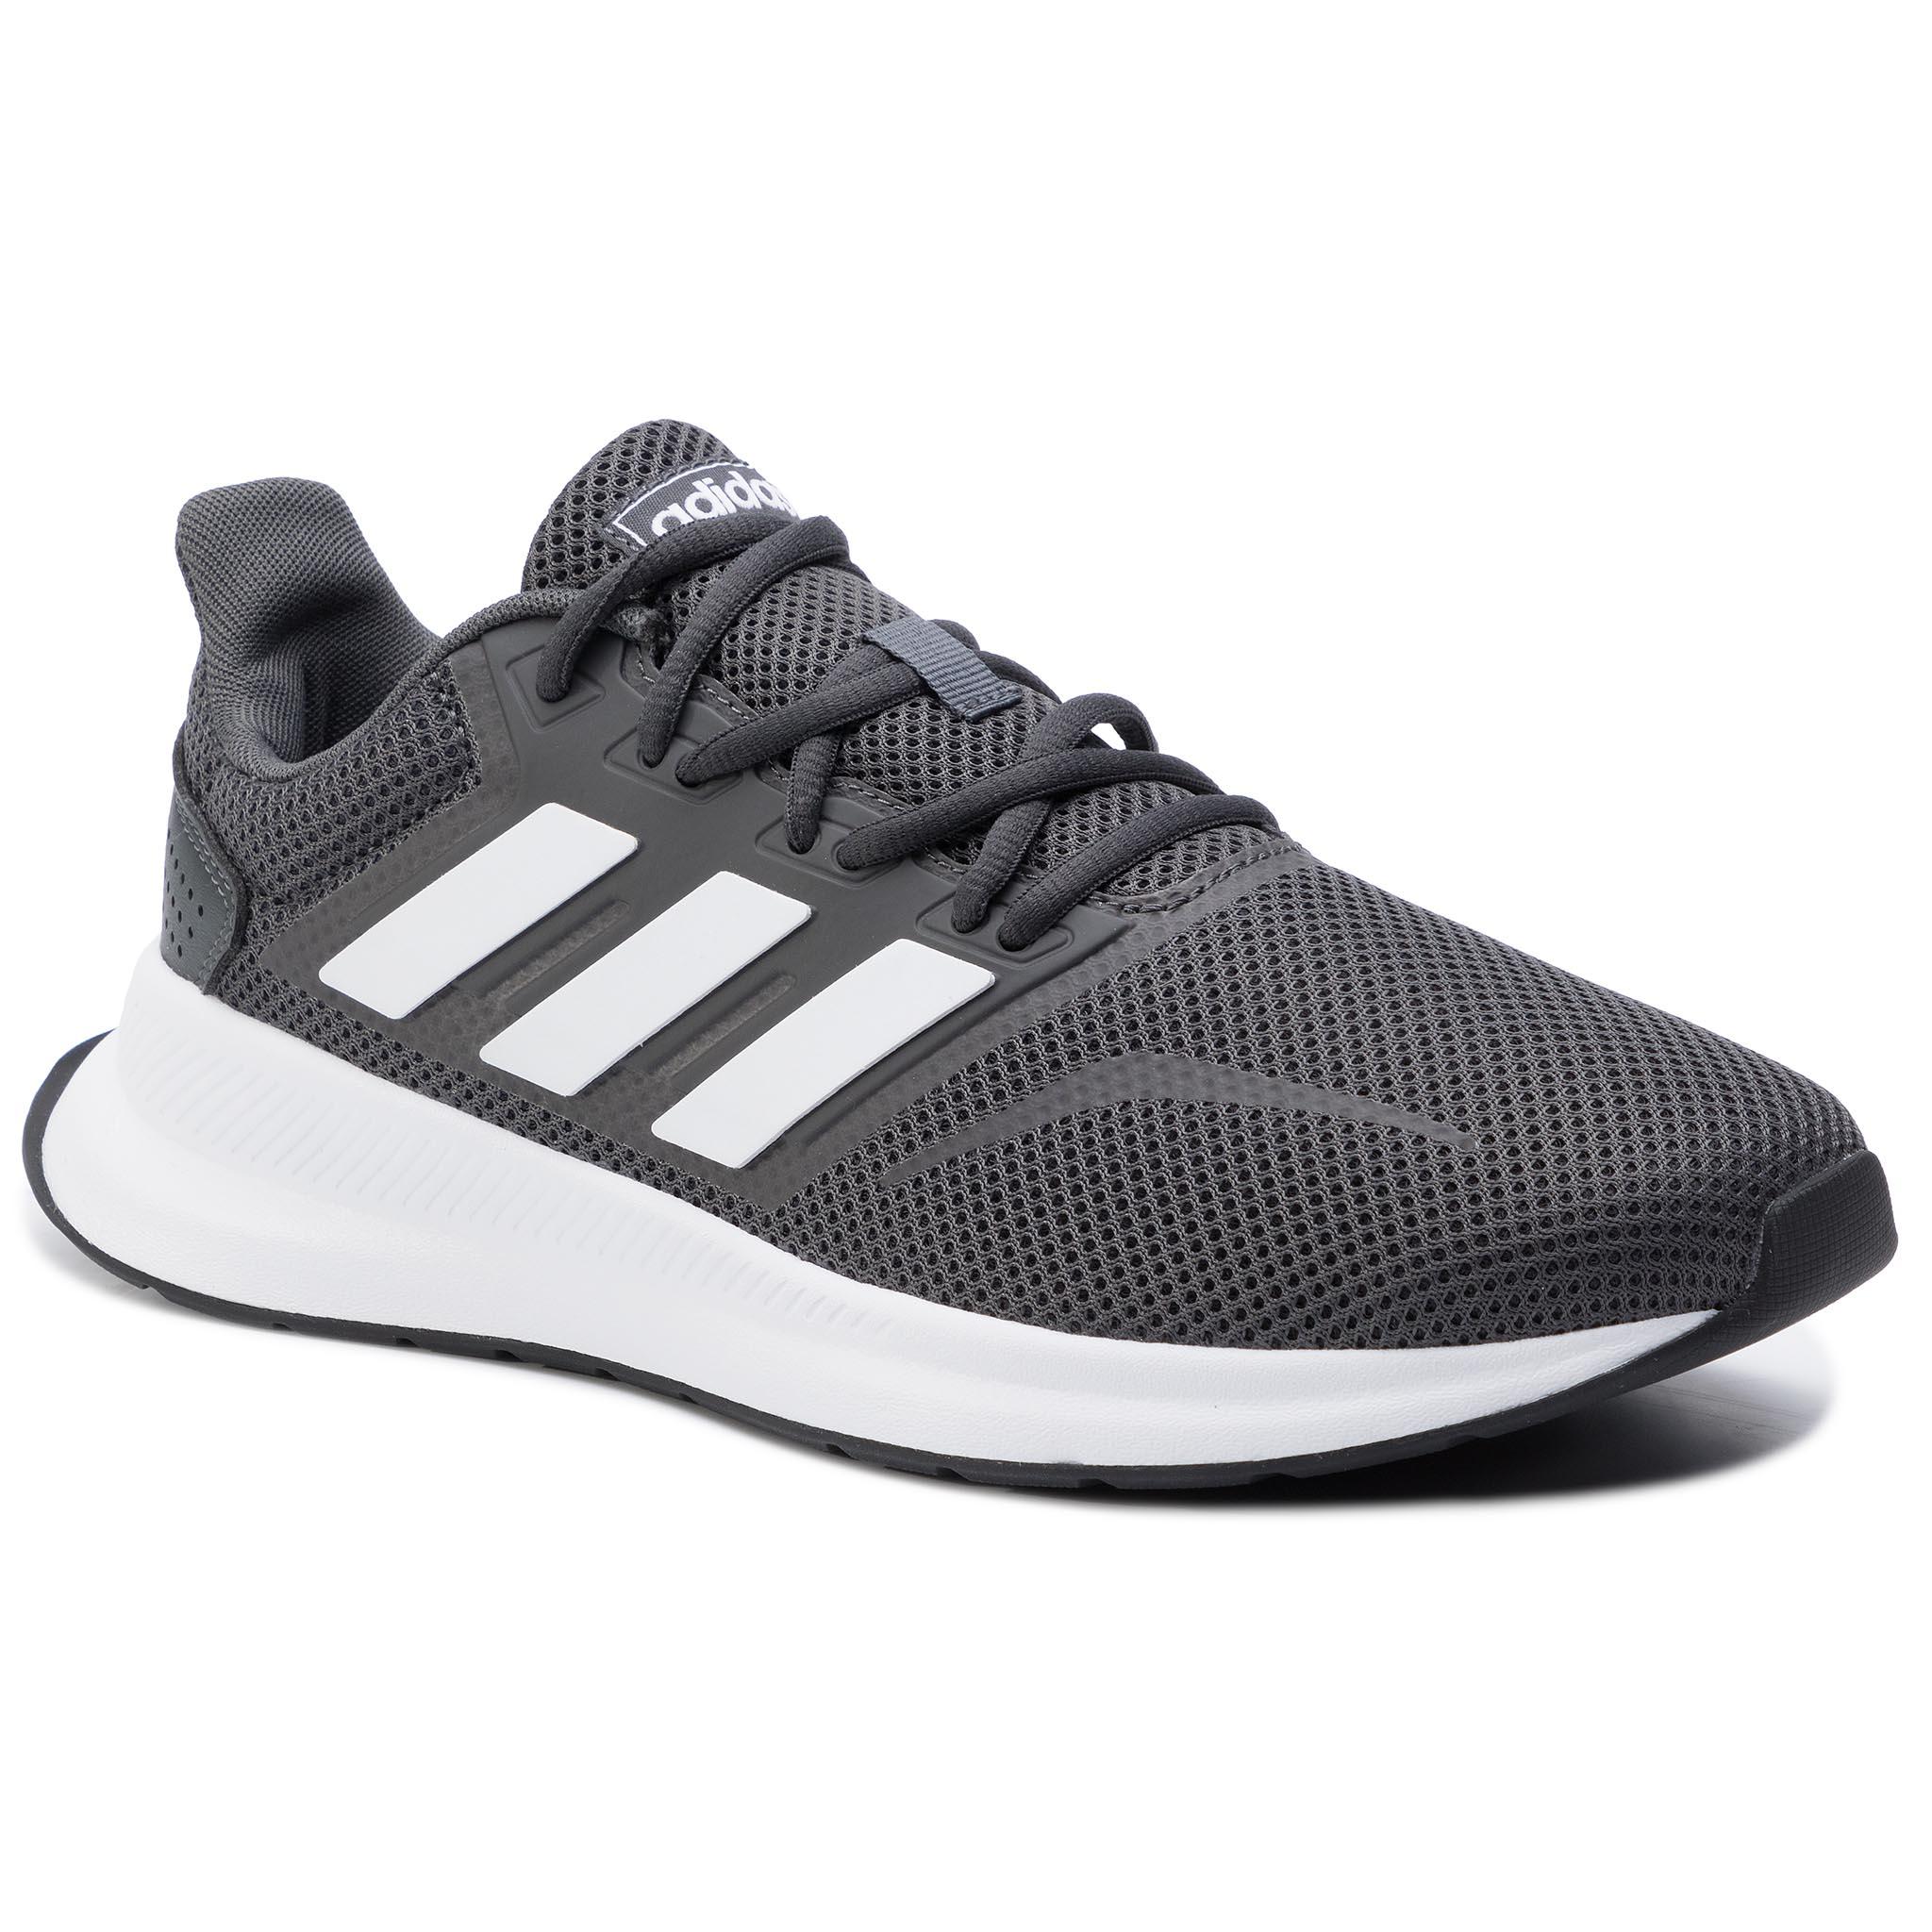 Topánky adidas - Runfalcon F36200 Gresix/Ftwwht/Cblack